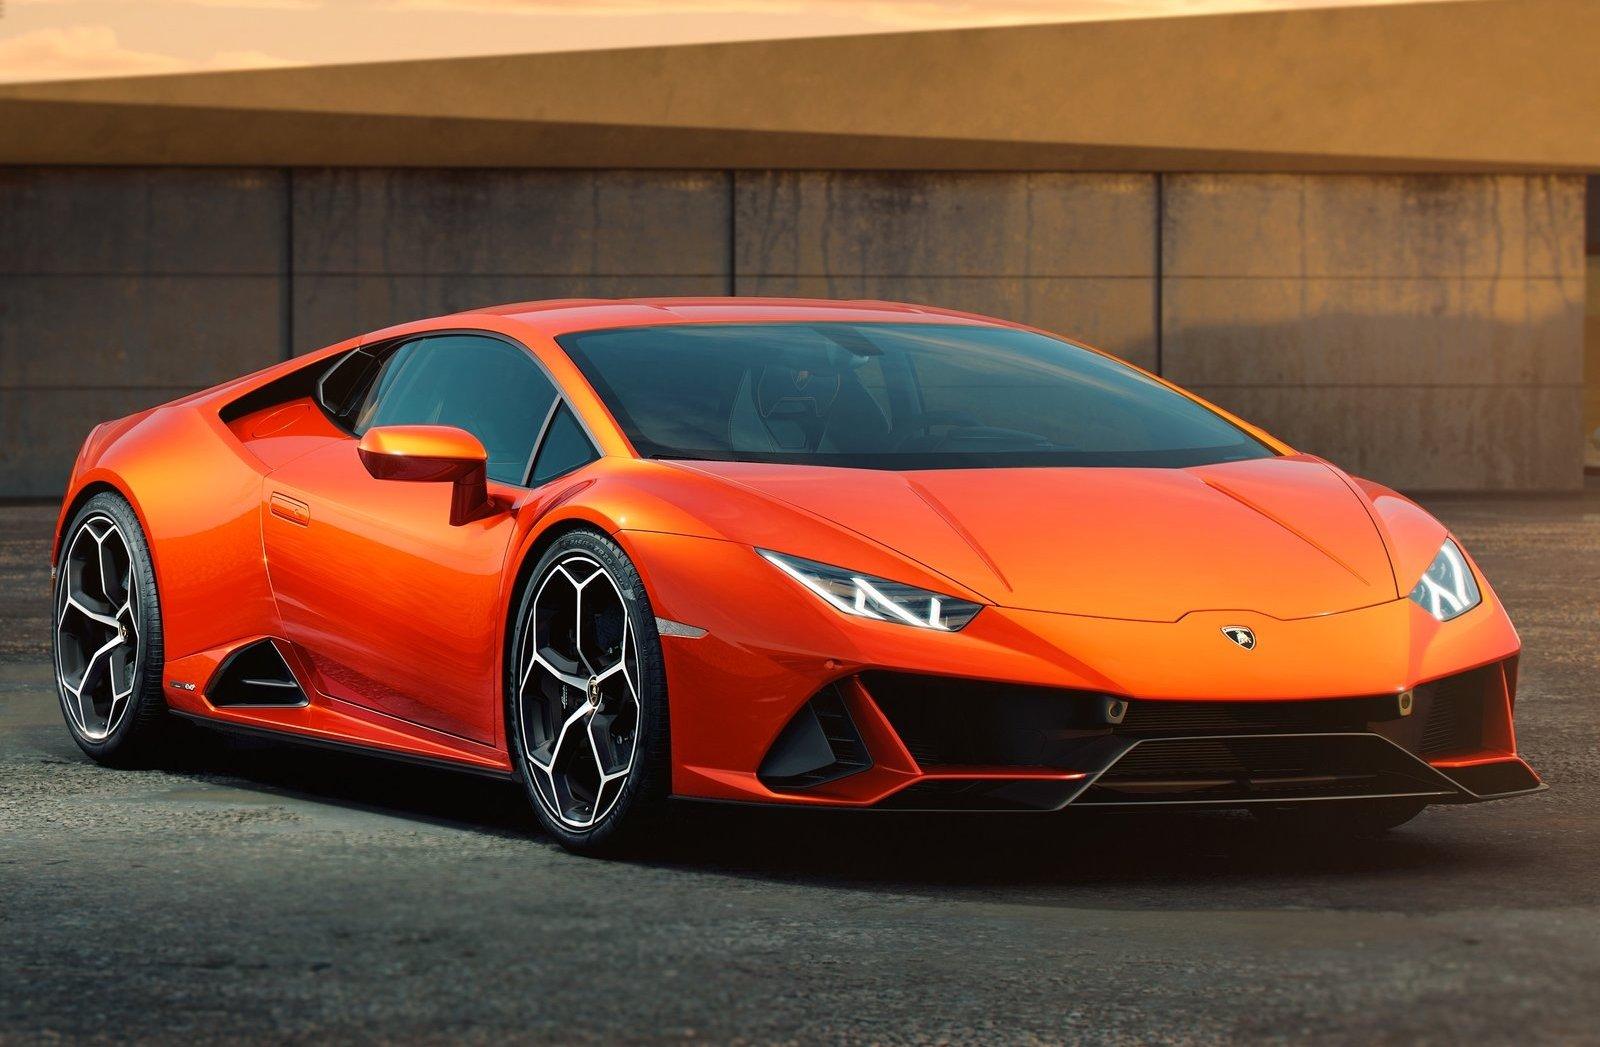 2019 Lamborghini Huracan Evo Revealed Performancedrive